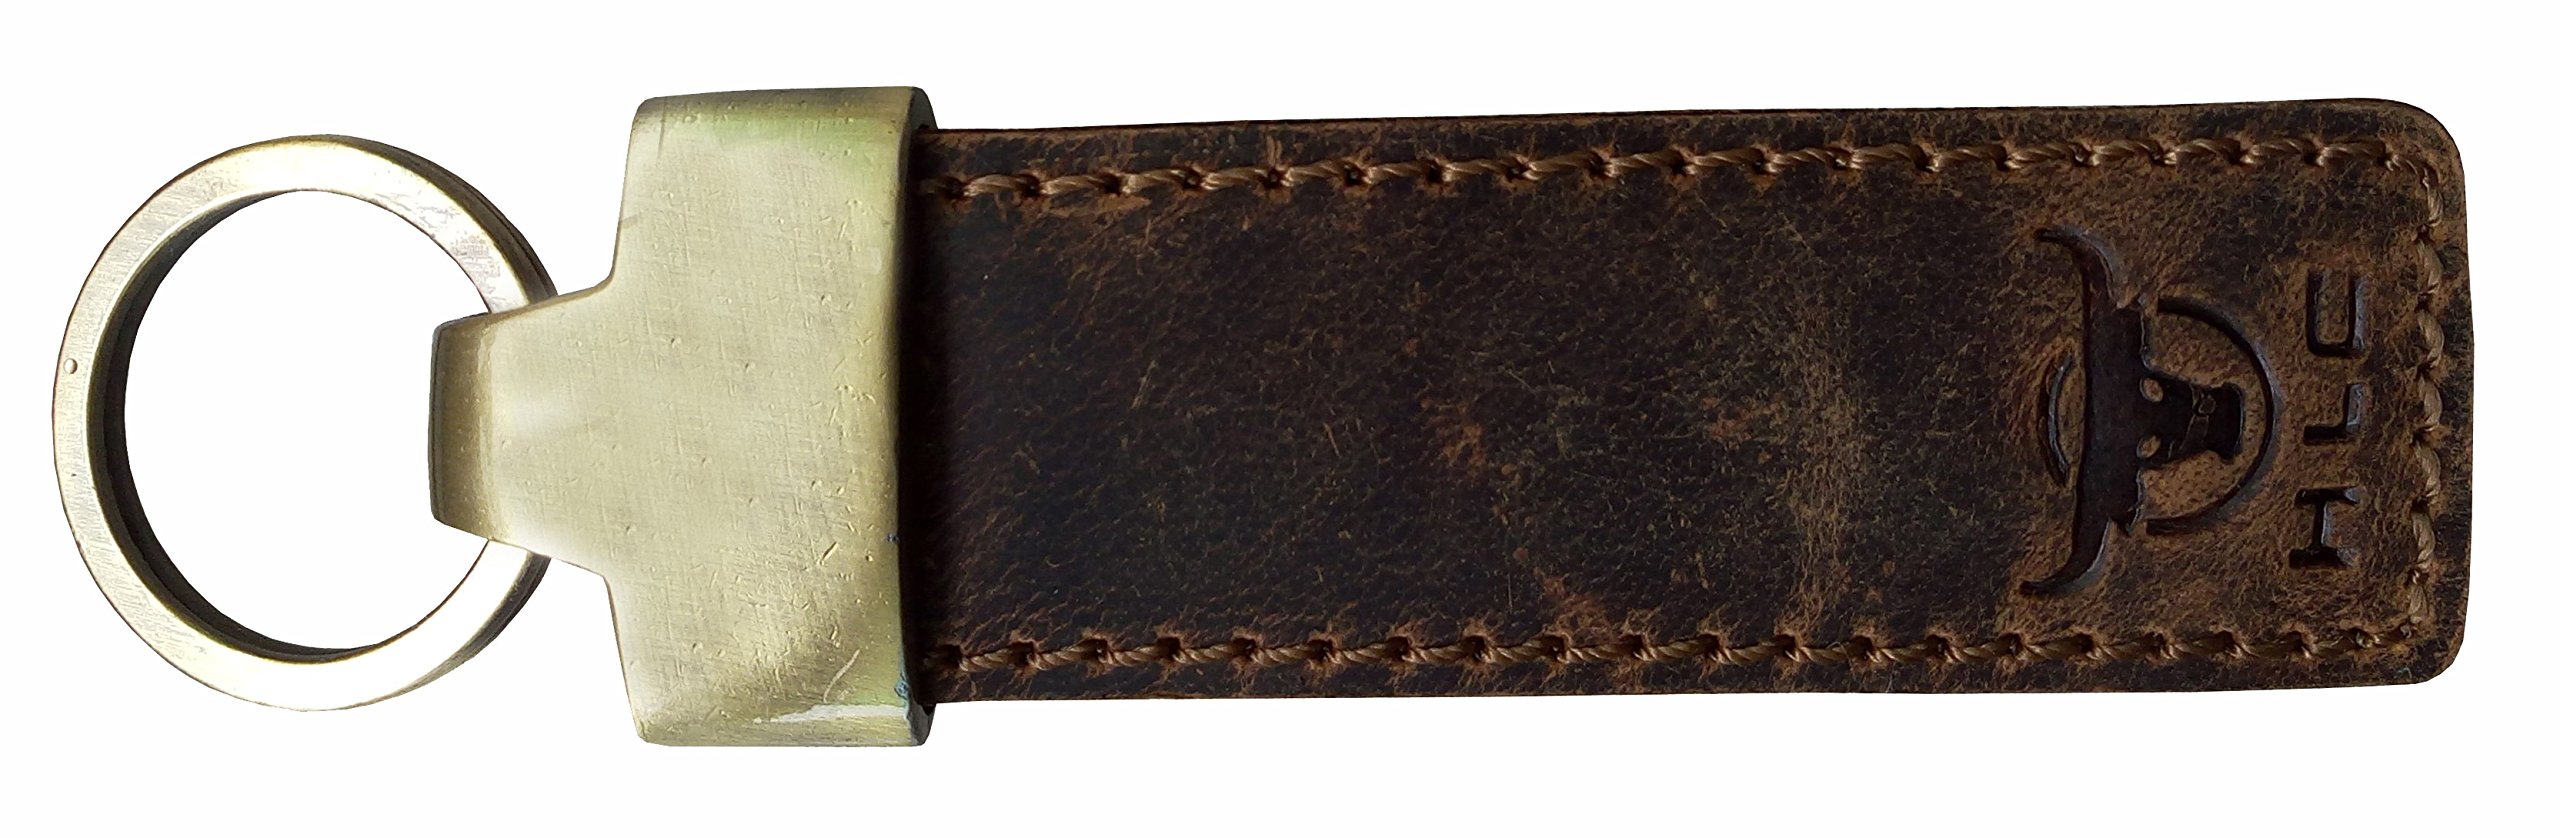 HLC Genuine Leather Elegant Multi Ring Crest Leather Key Chain